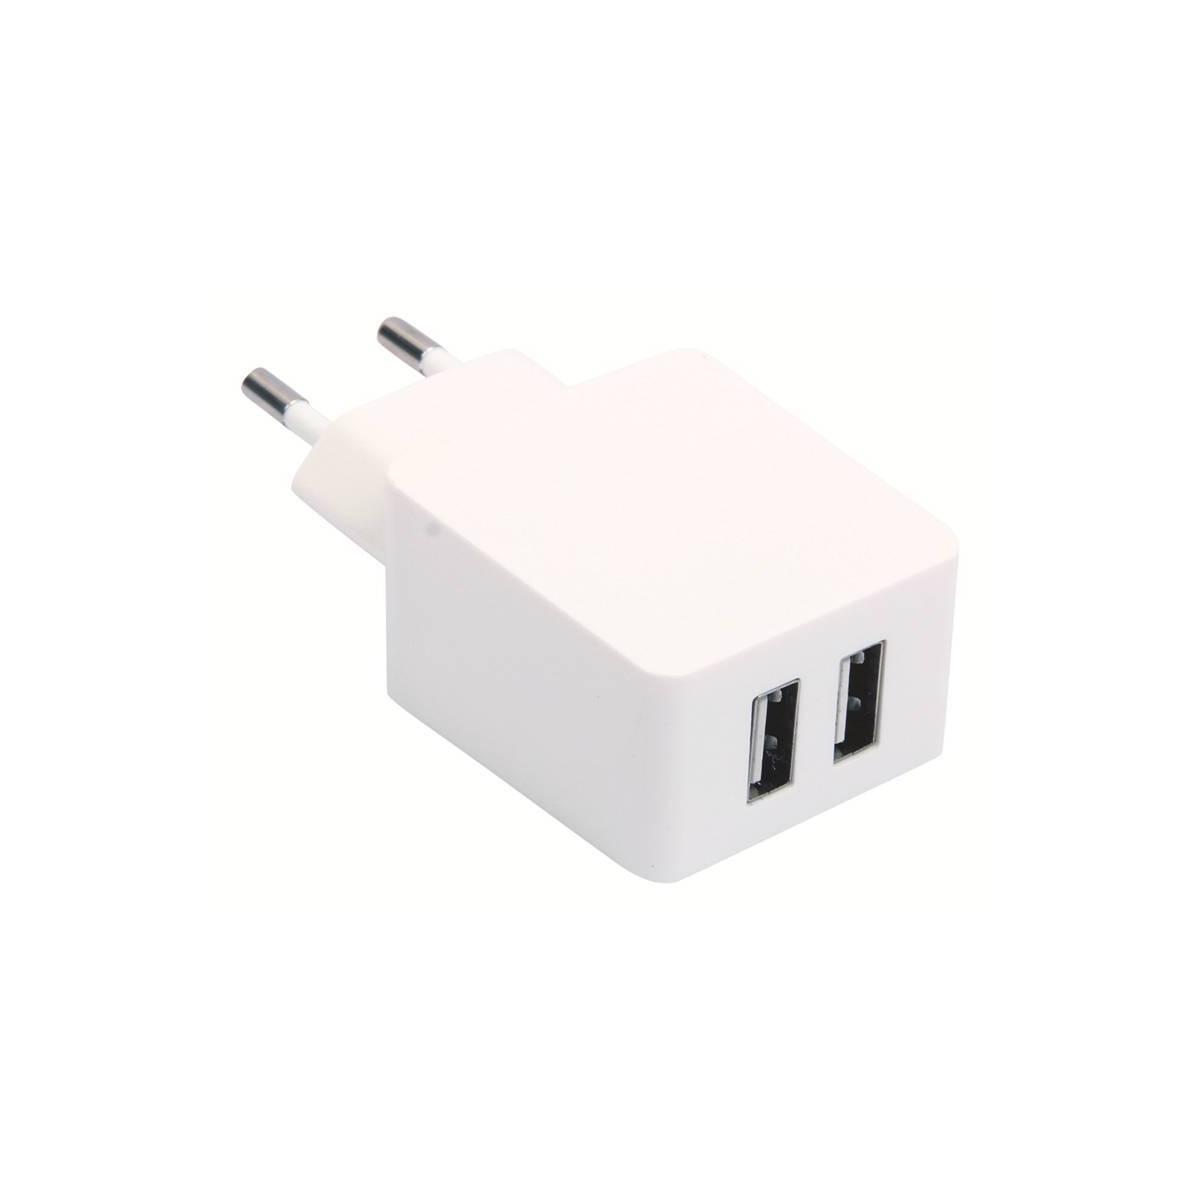 Sinox i Media iPhoneiPad USB & USB C oplader MacKabler.dk